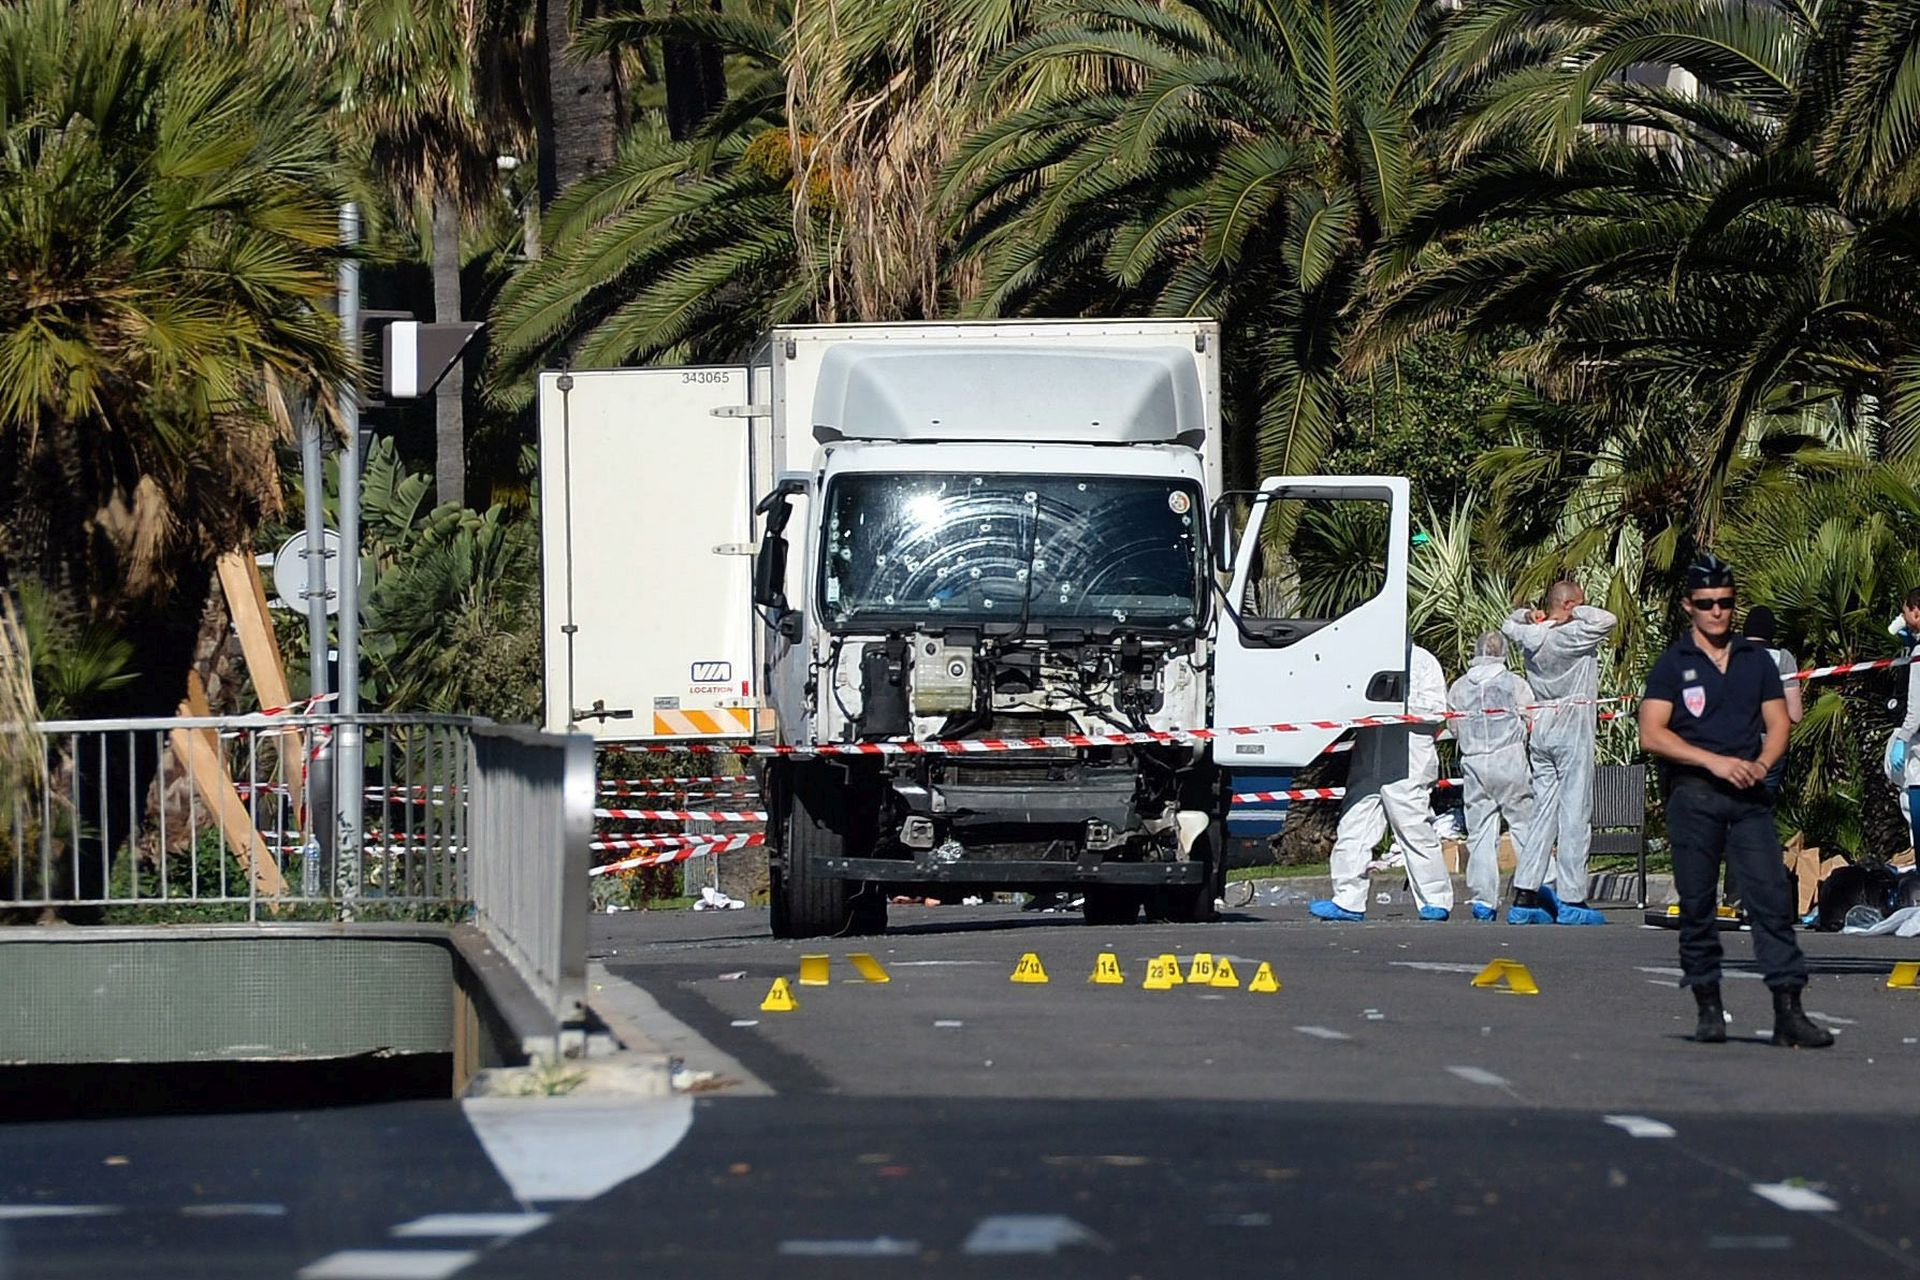 ISTRAGA POKAZALA: Atentator iz Nice planirao napad i zainteresirao se za džihadizam